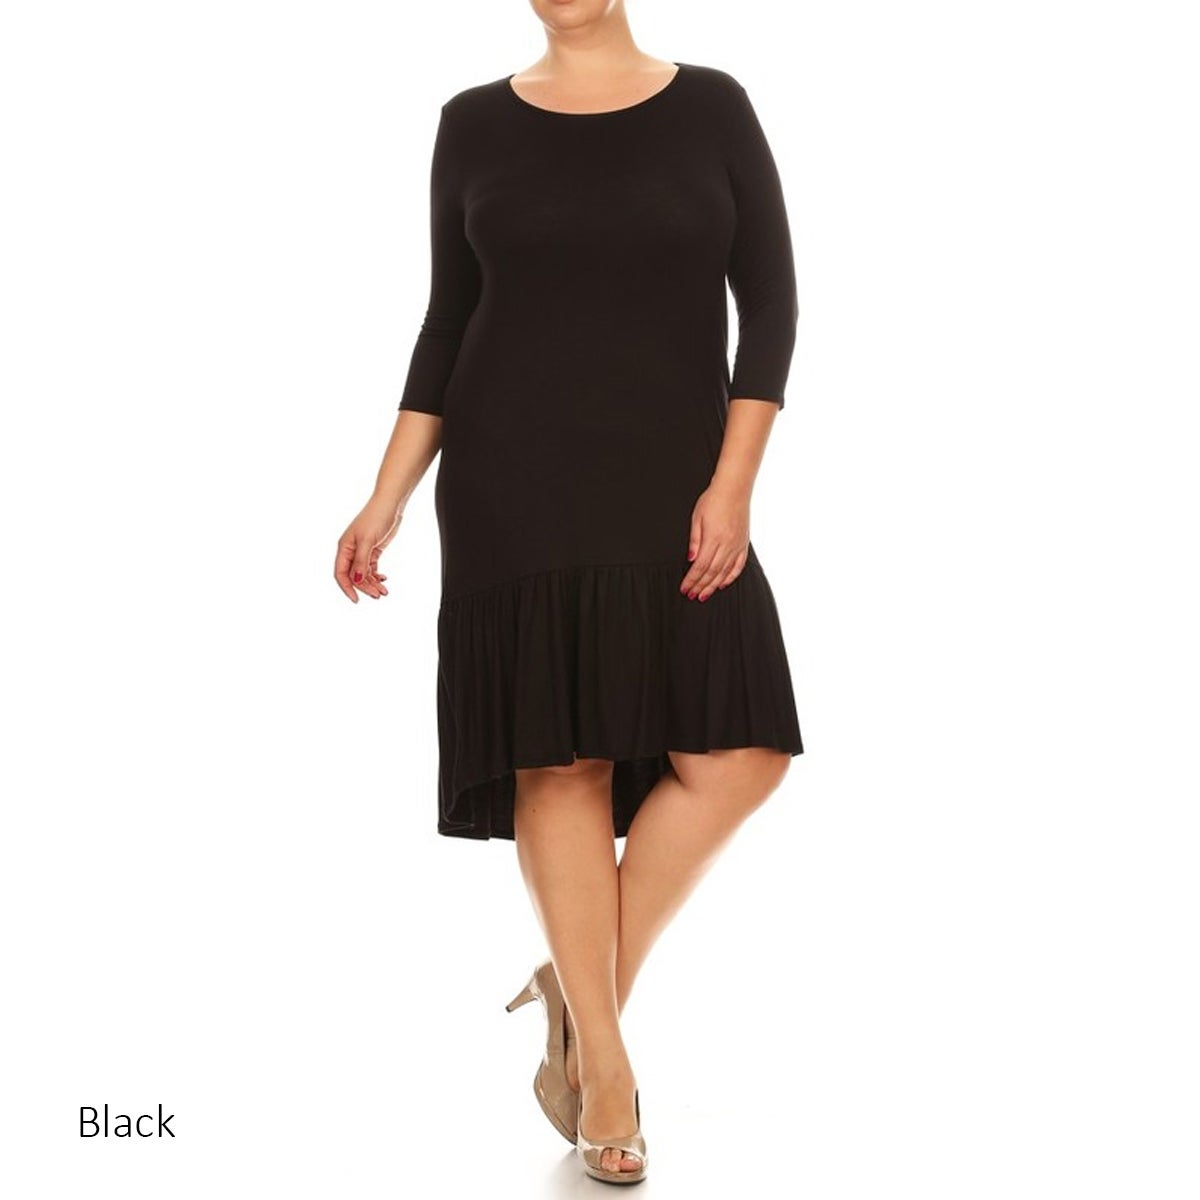 c52da869b95 Shop Women s Plus Size Jersey Knit Dress - On Sale - Free Shipping ...